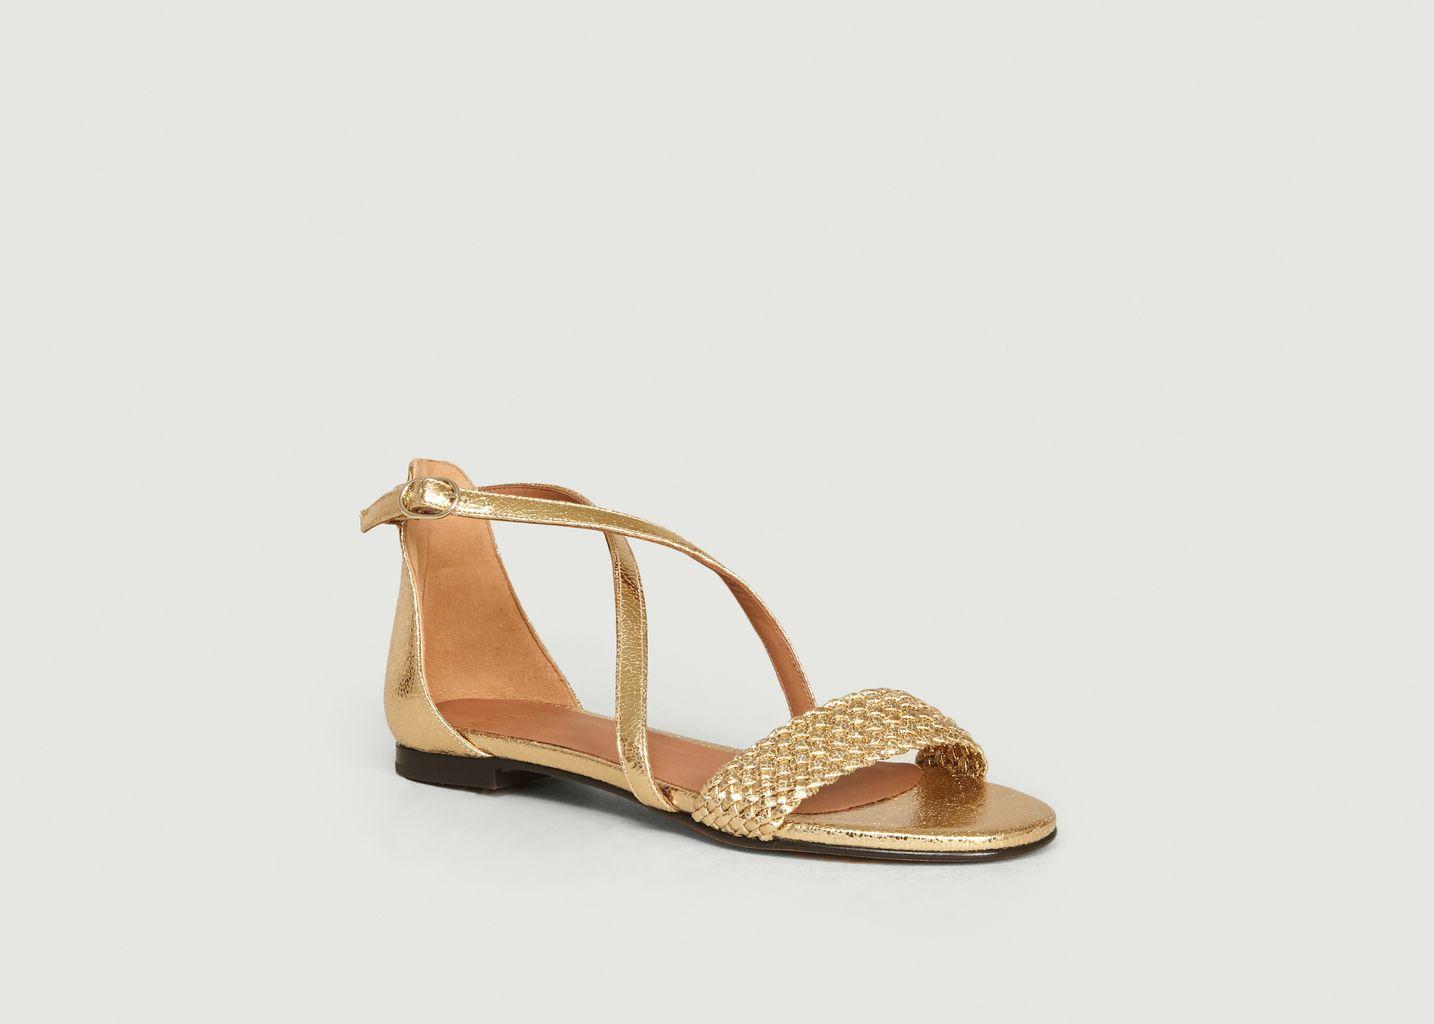 Sandales plates en cuir craquelé Tal - Anaki